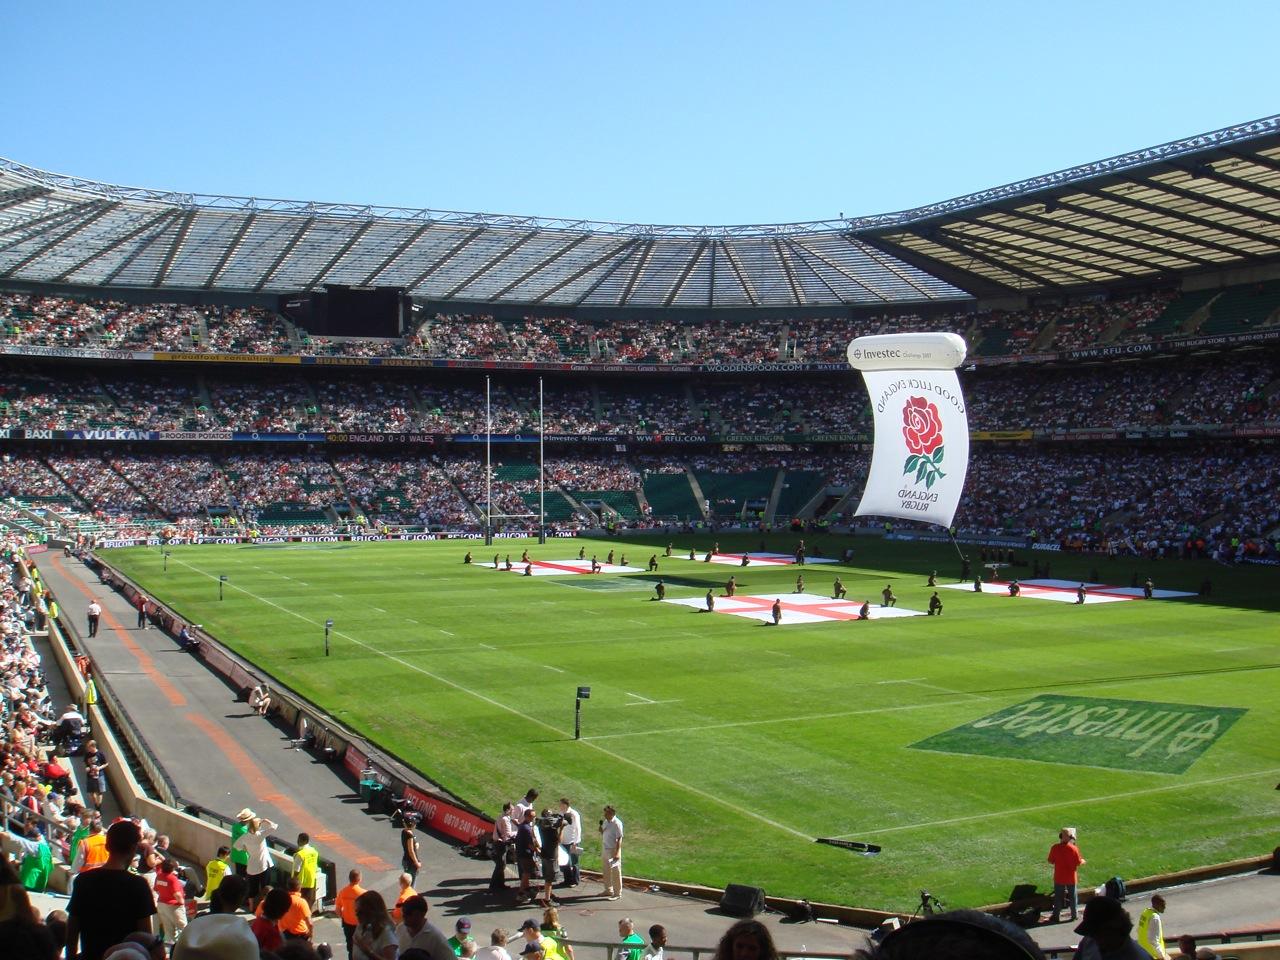 Twickenham World Rugby Museum and Stadium Tour in London